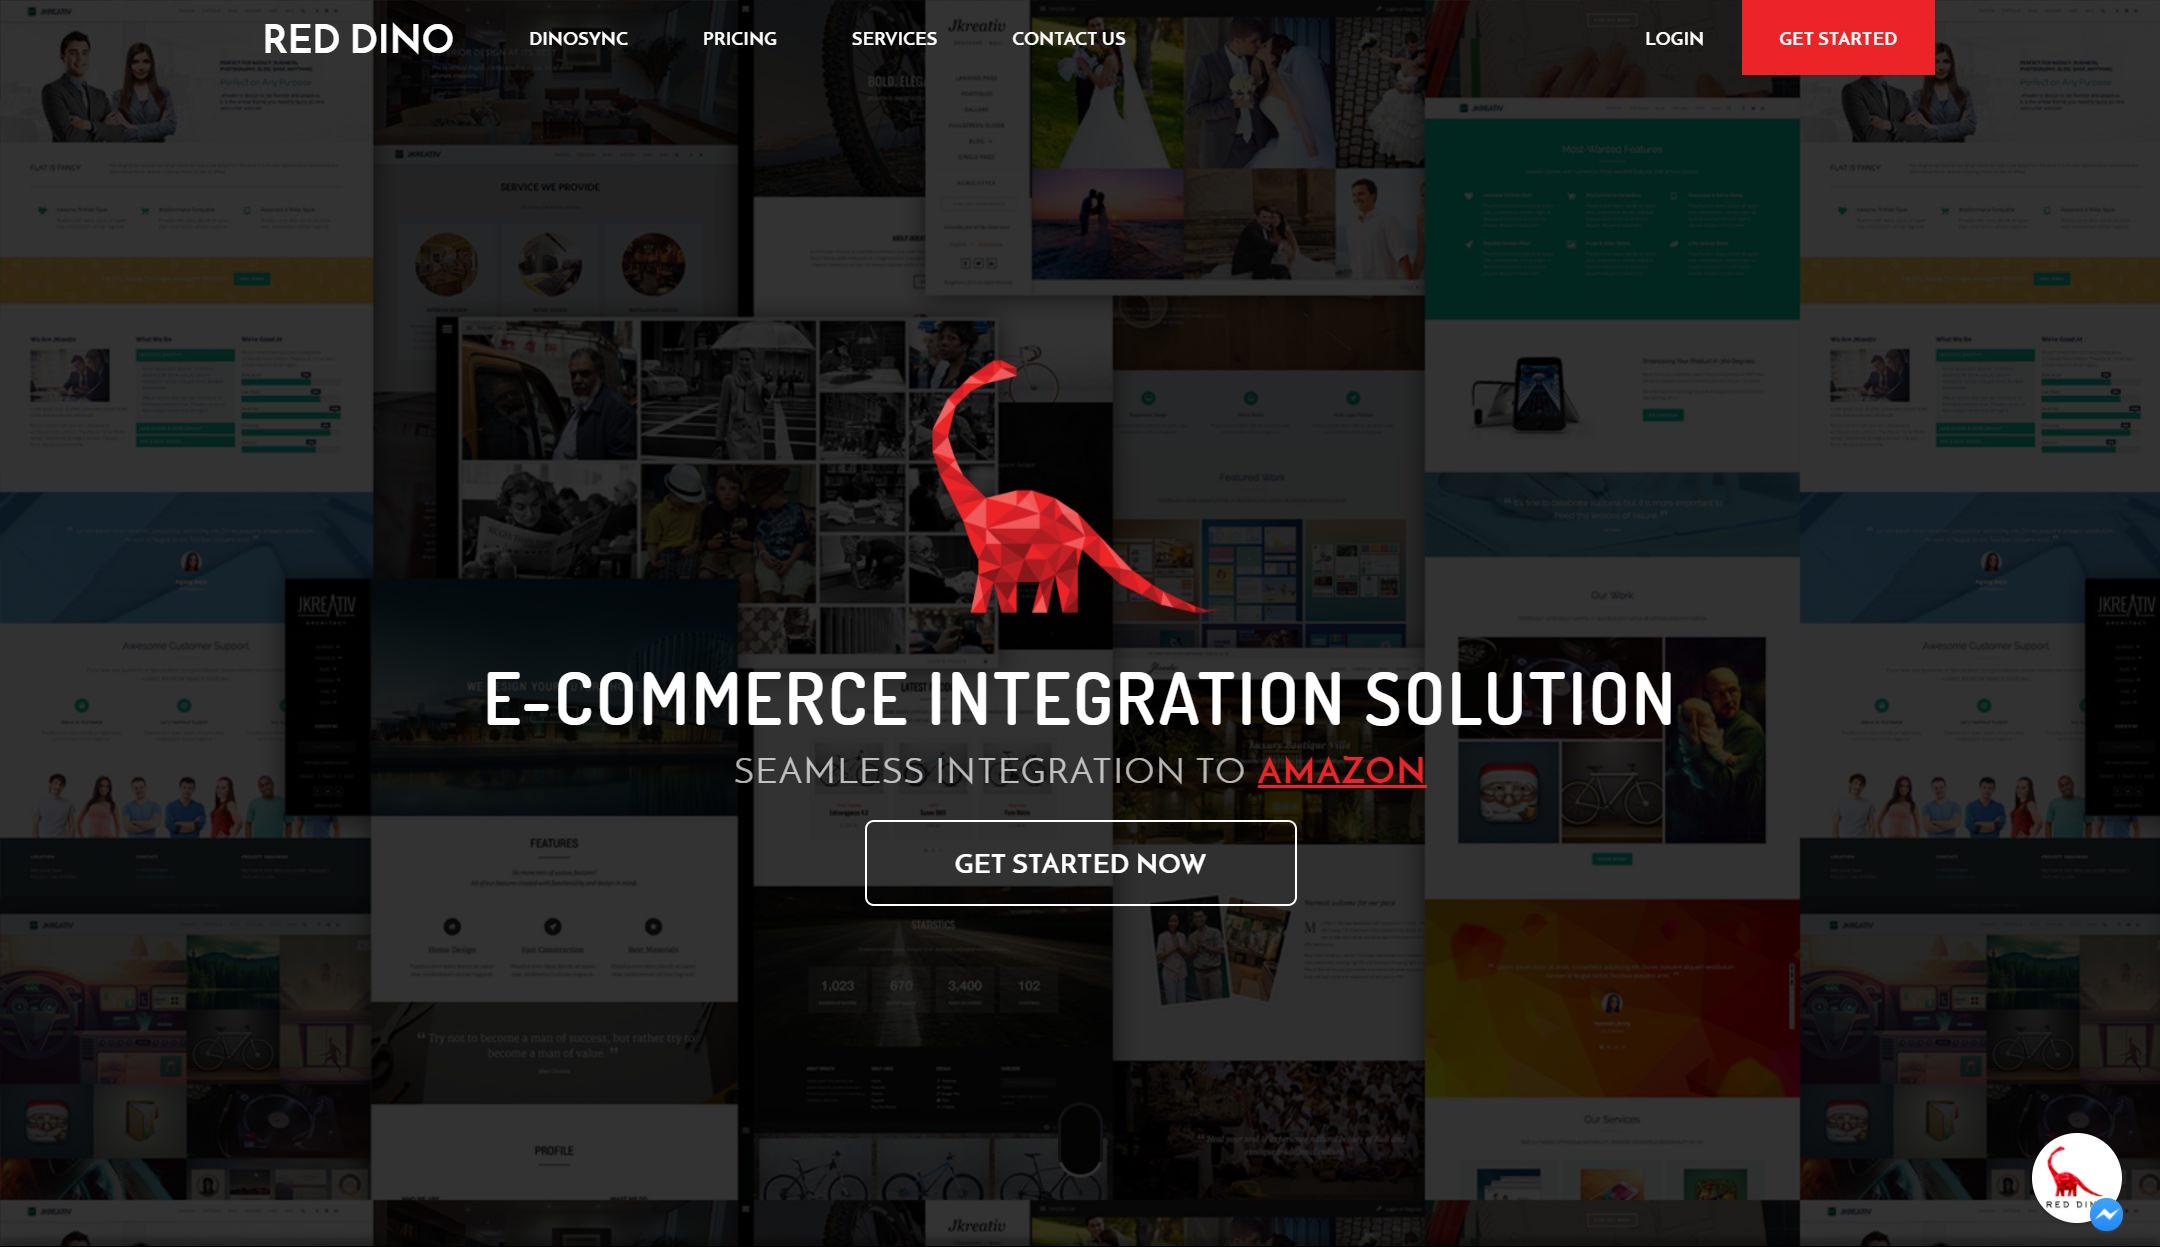 Red Dino Venture | E-Commerce Integration Solution